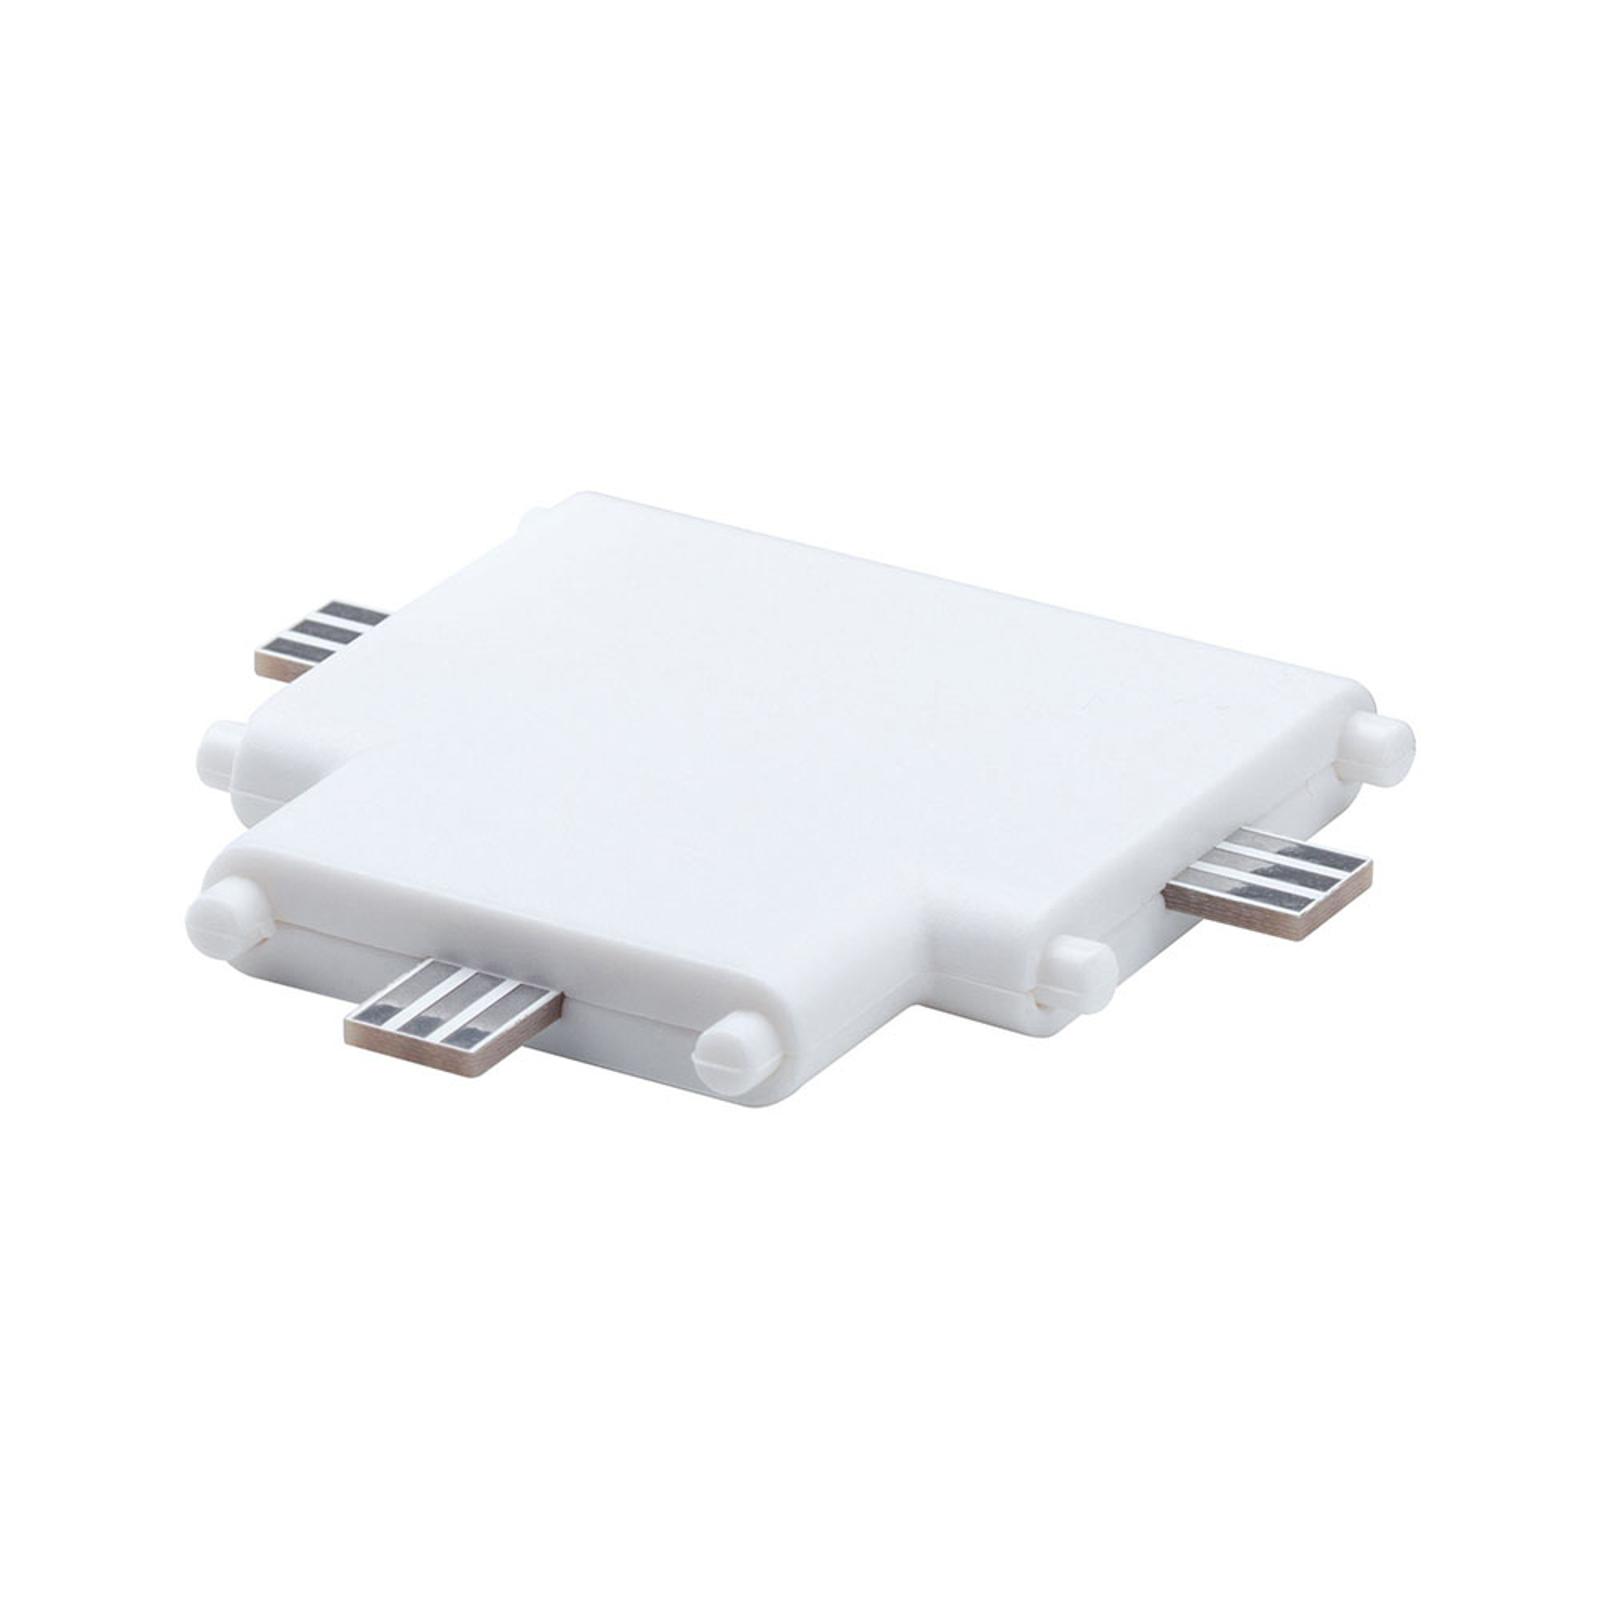 Paulmann Clever Connect T-Verbinder Border